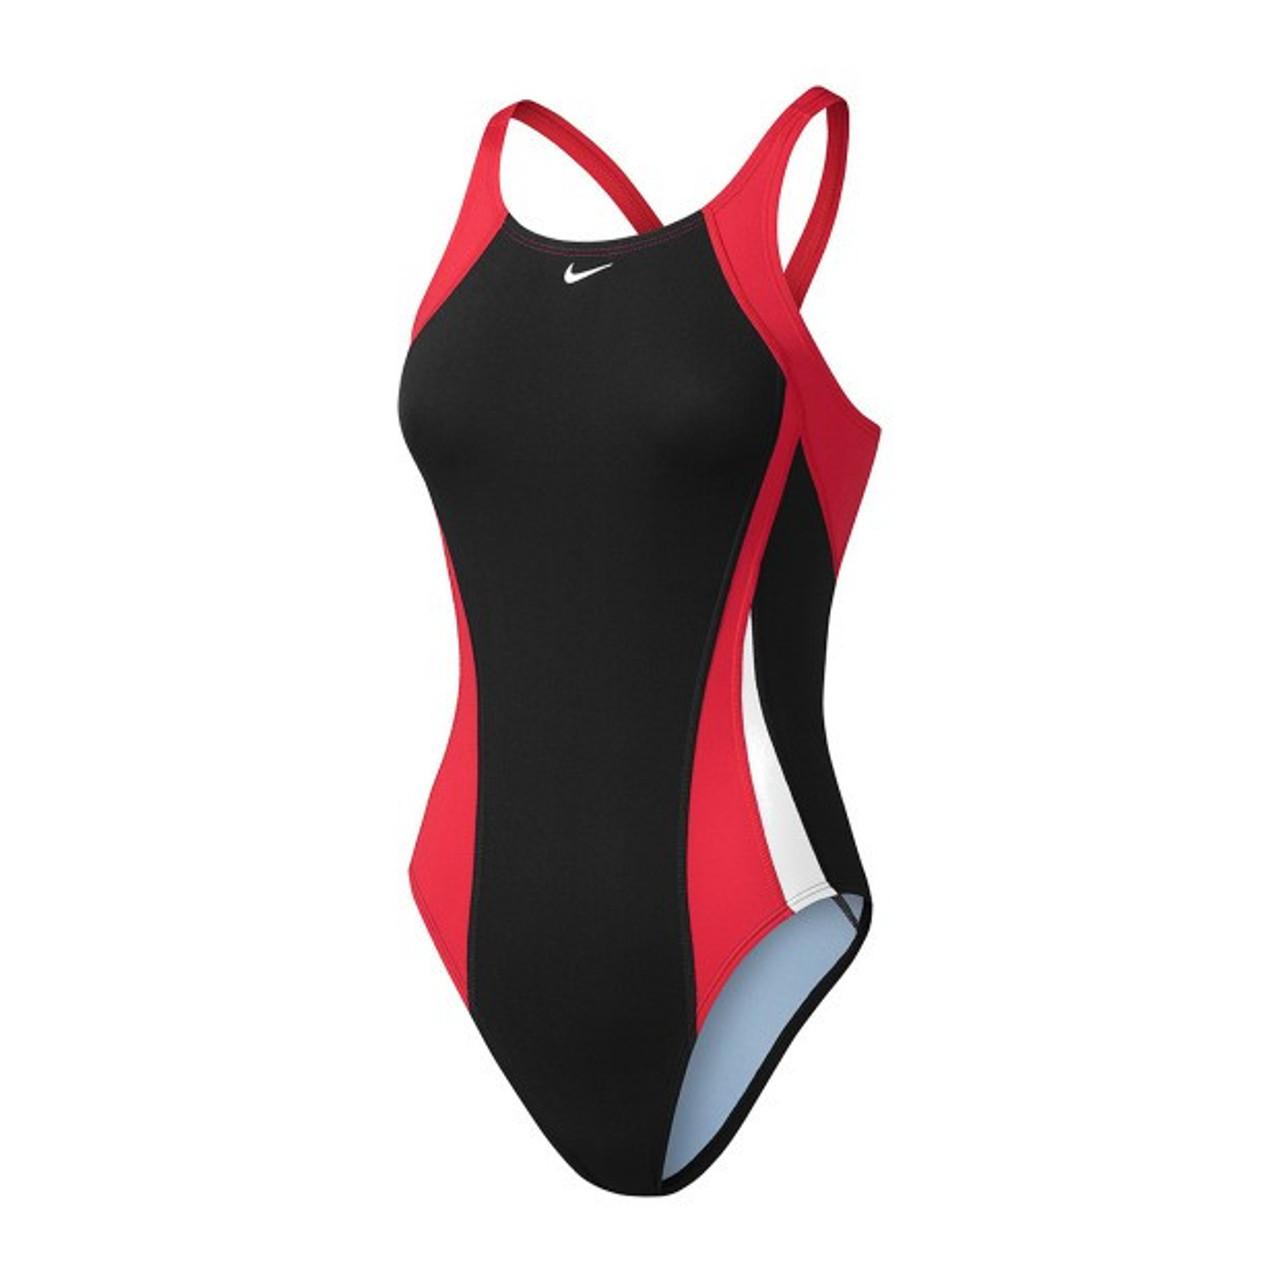 1bd486b1b26 Nike Women's Poly Core Surge Fastback Tank Swimsuit